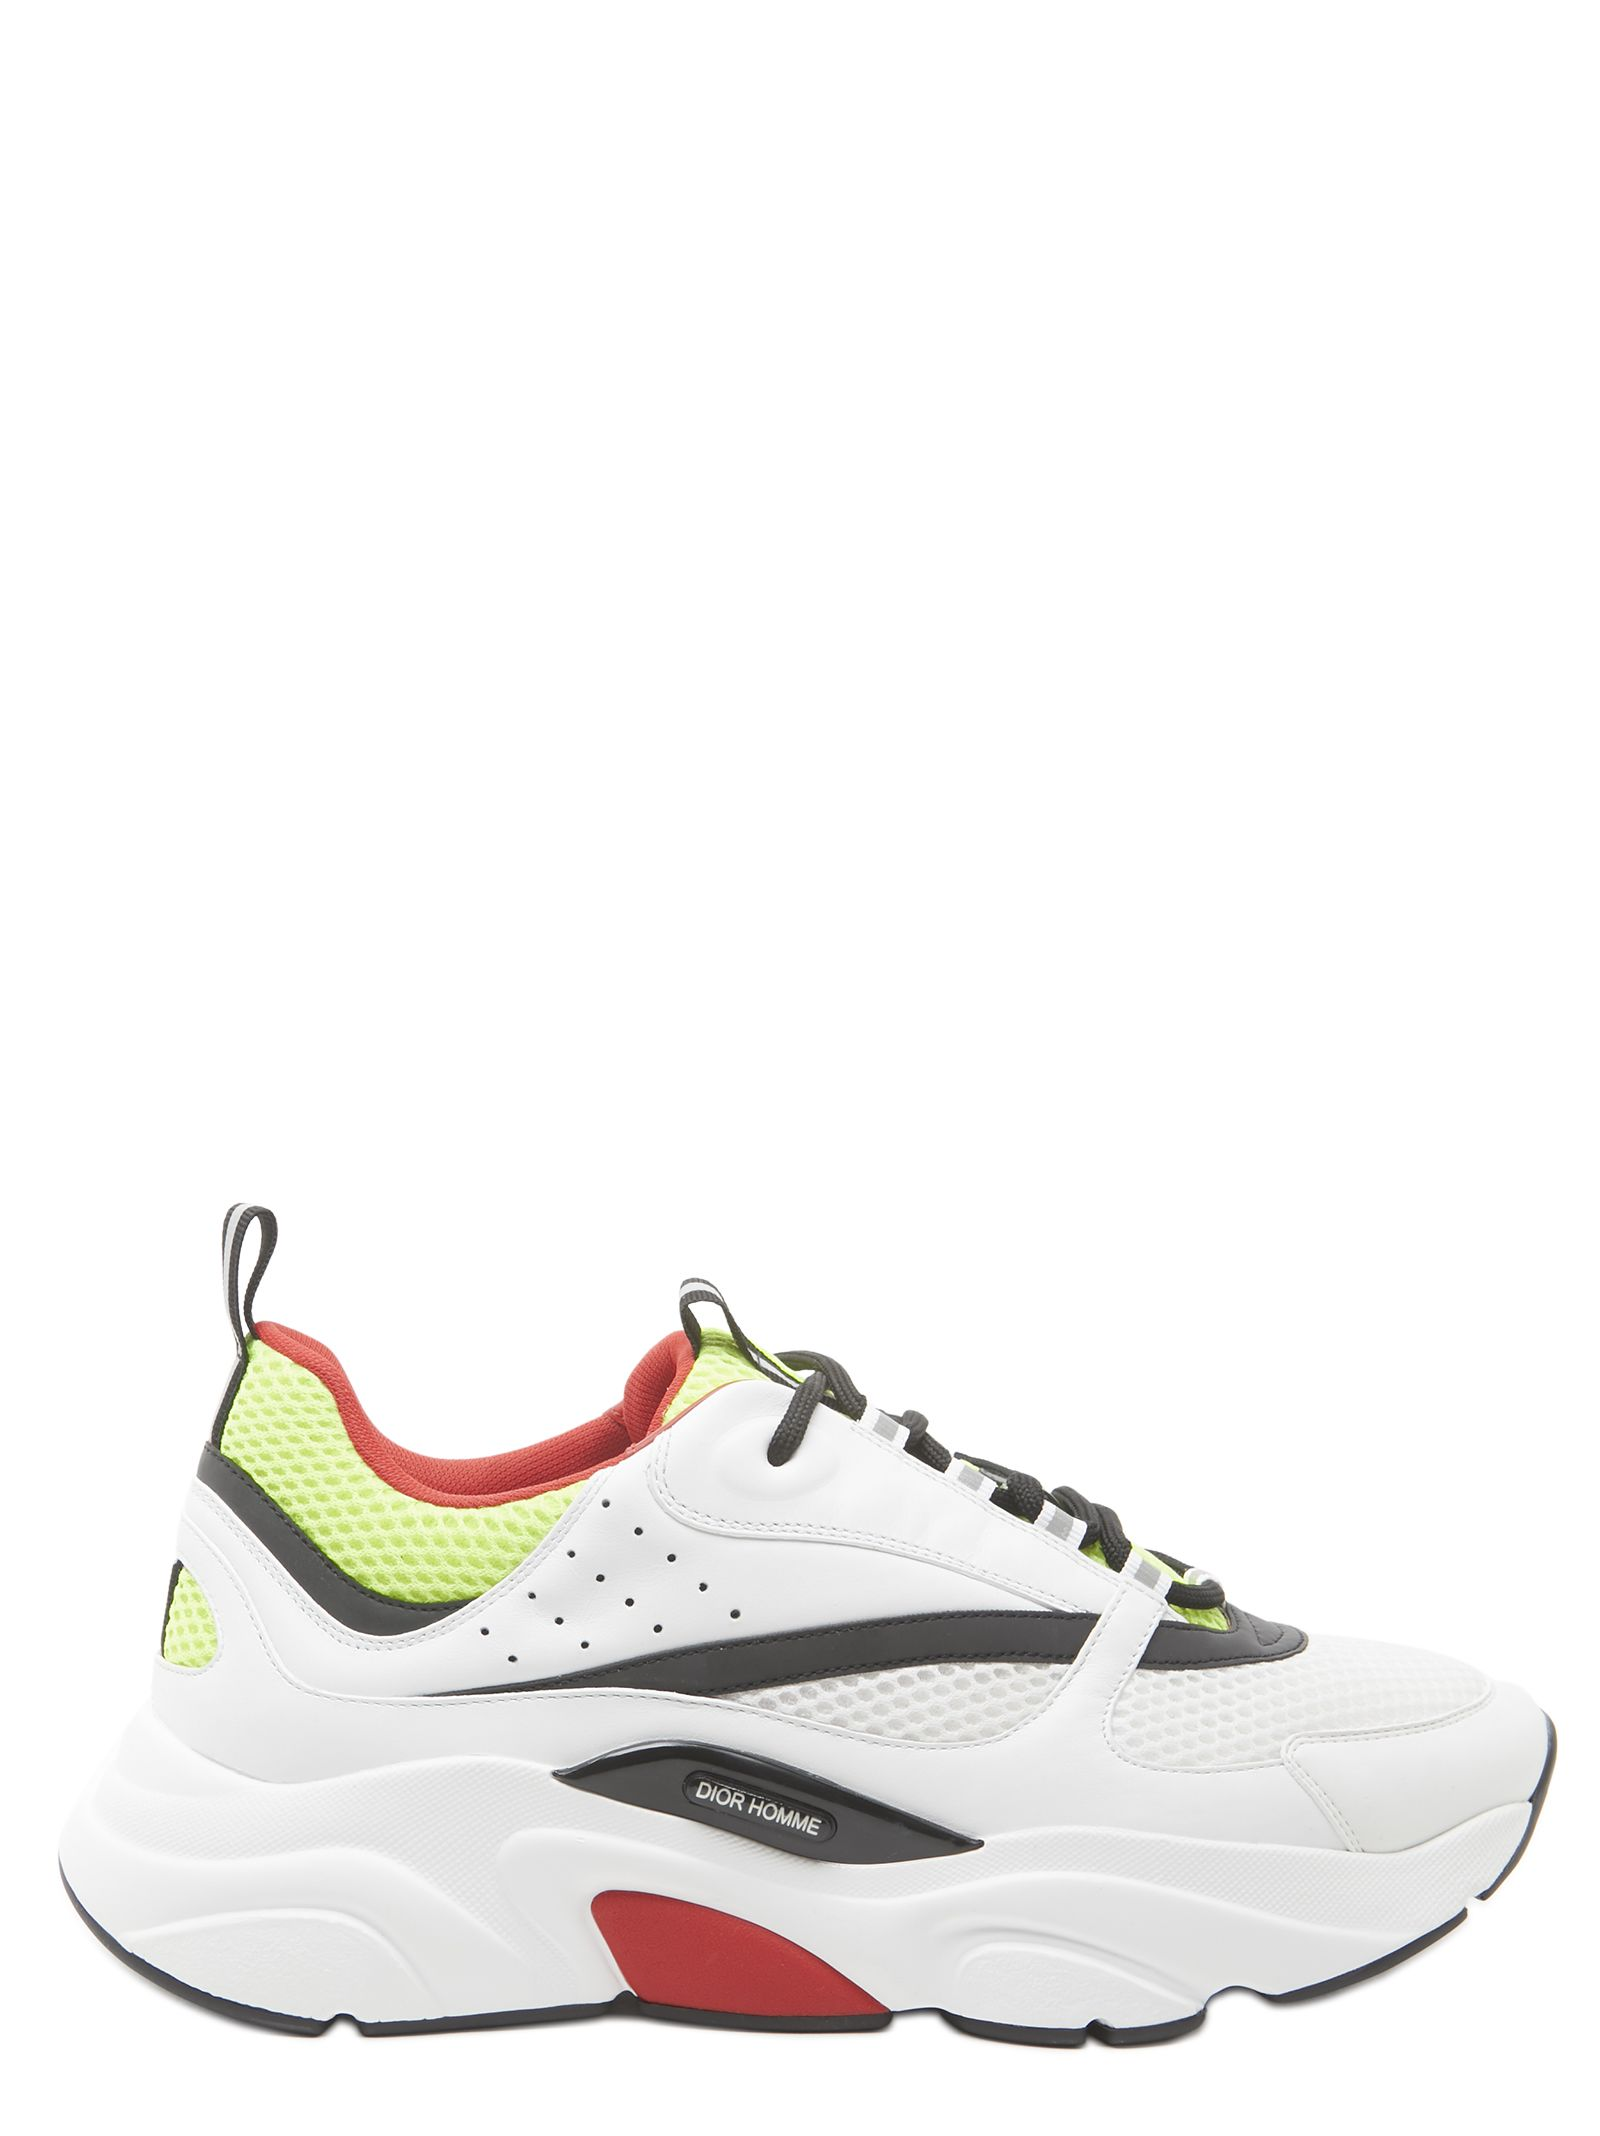 DIOR HOMME Sneaker in Multicolor